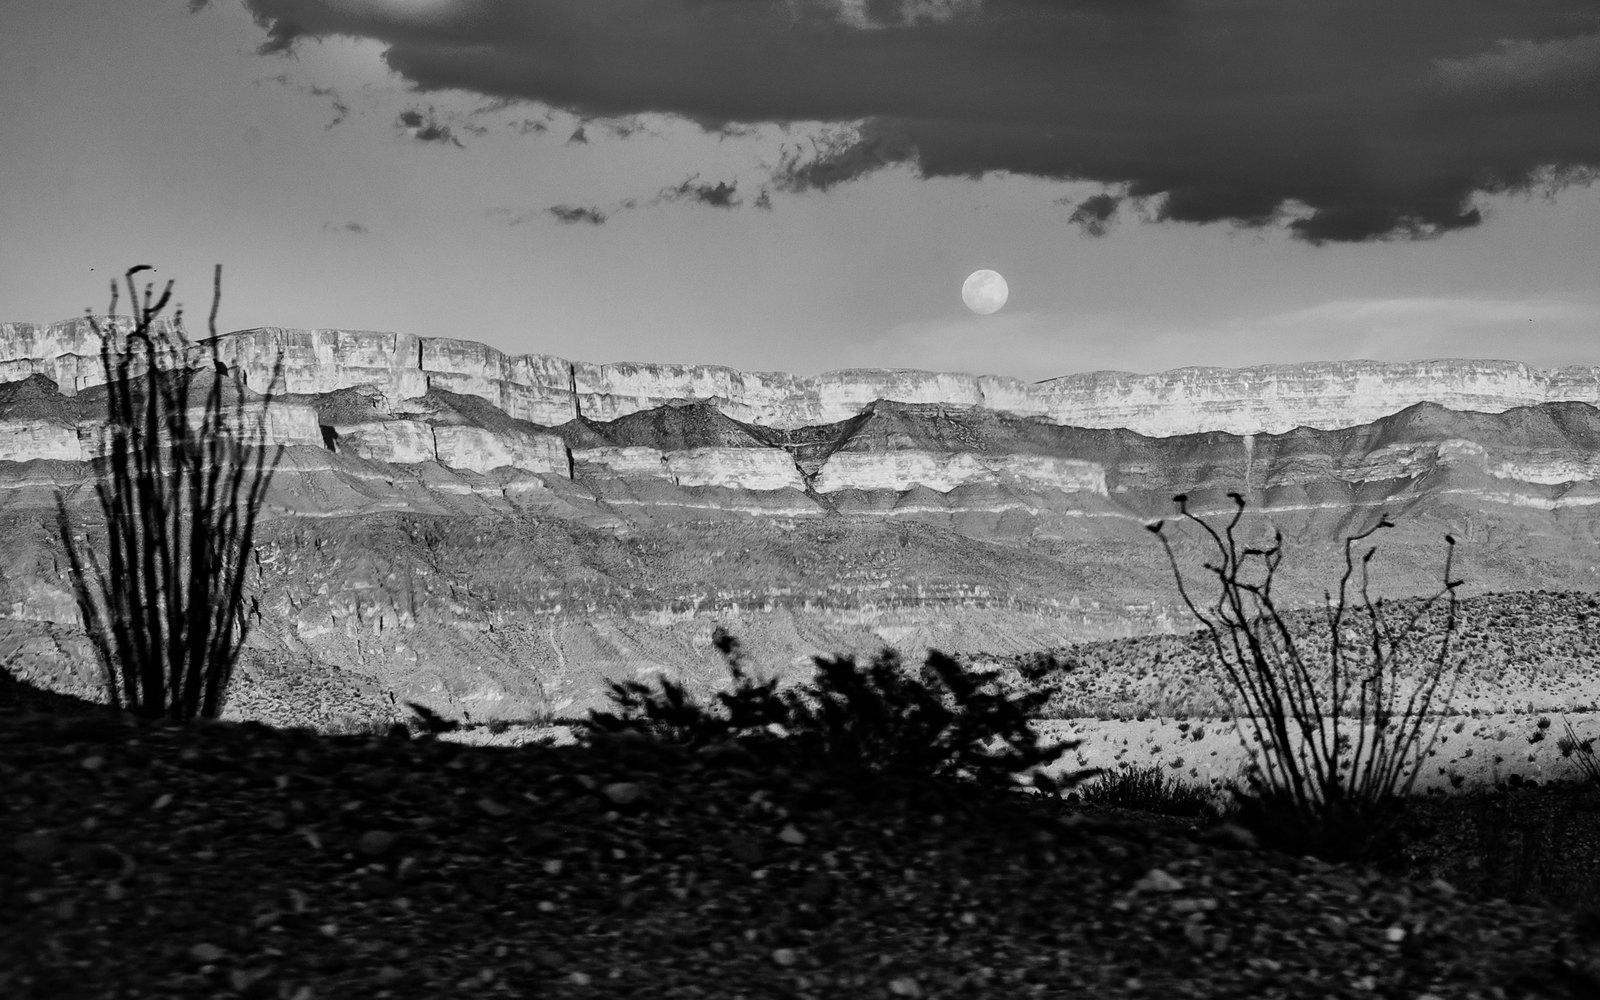 Moonrise in Big Bend